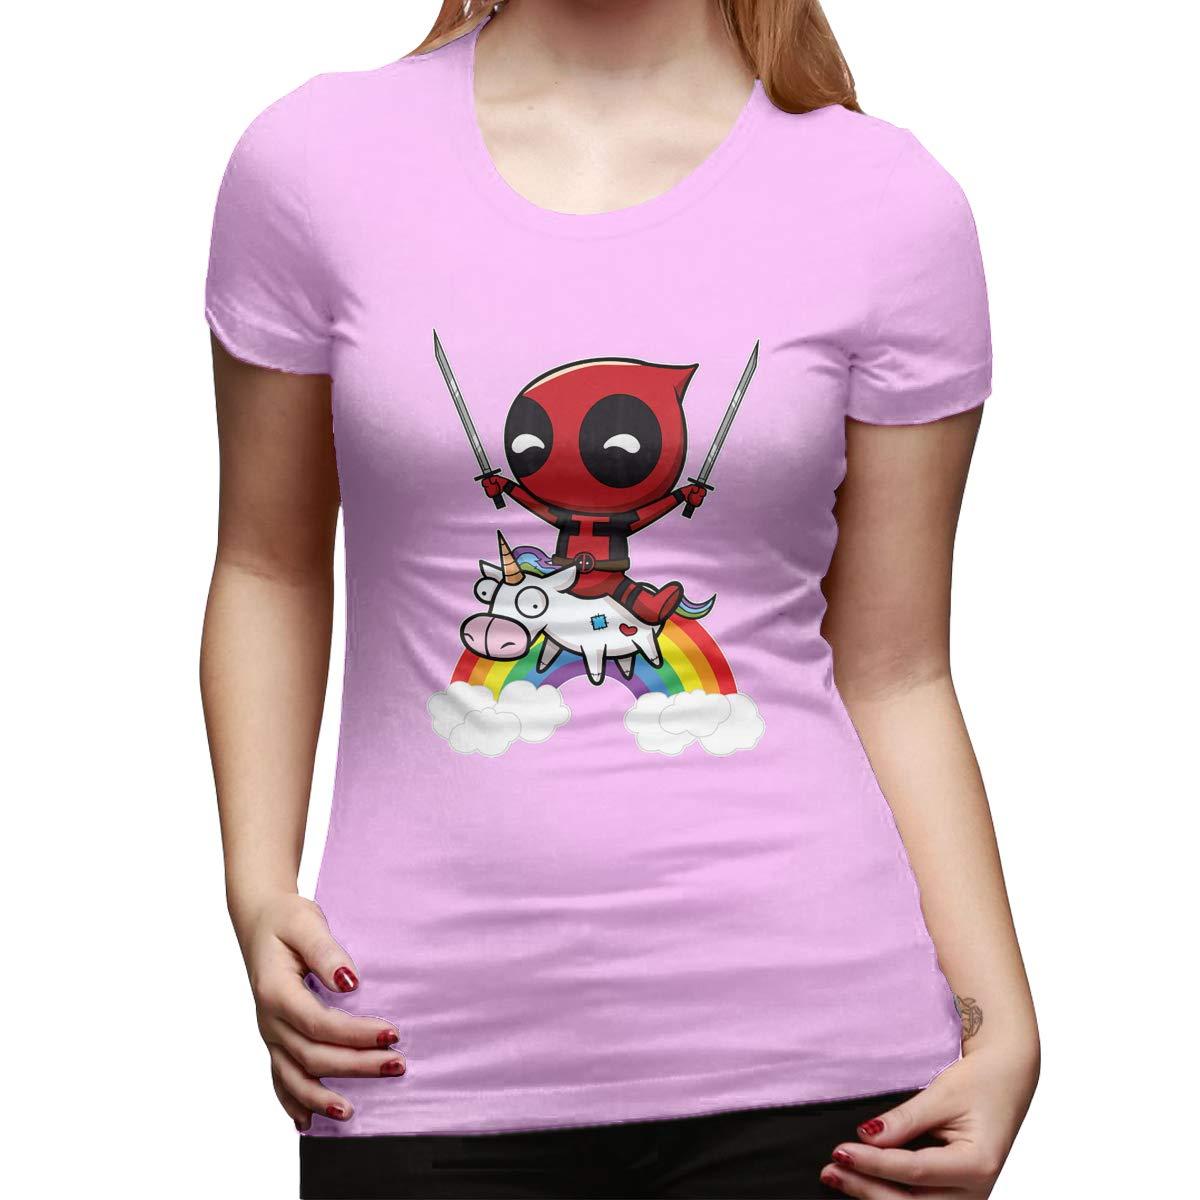 Cghtaym Riding A Unicorn Funny Humor Pattern Short Sleeve T Shirt Girls Tee Top 4112